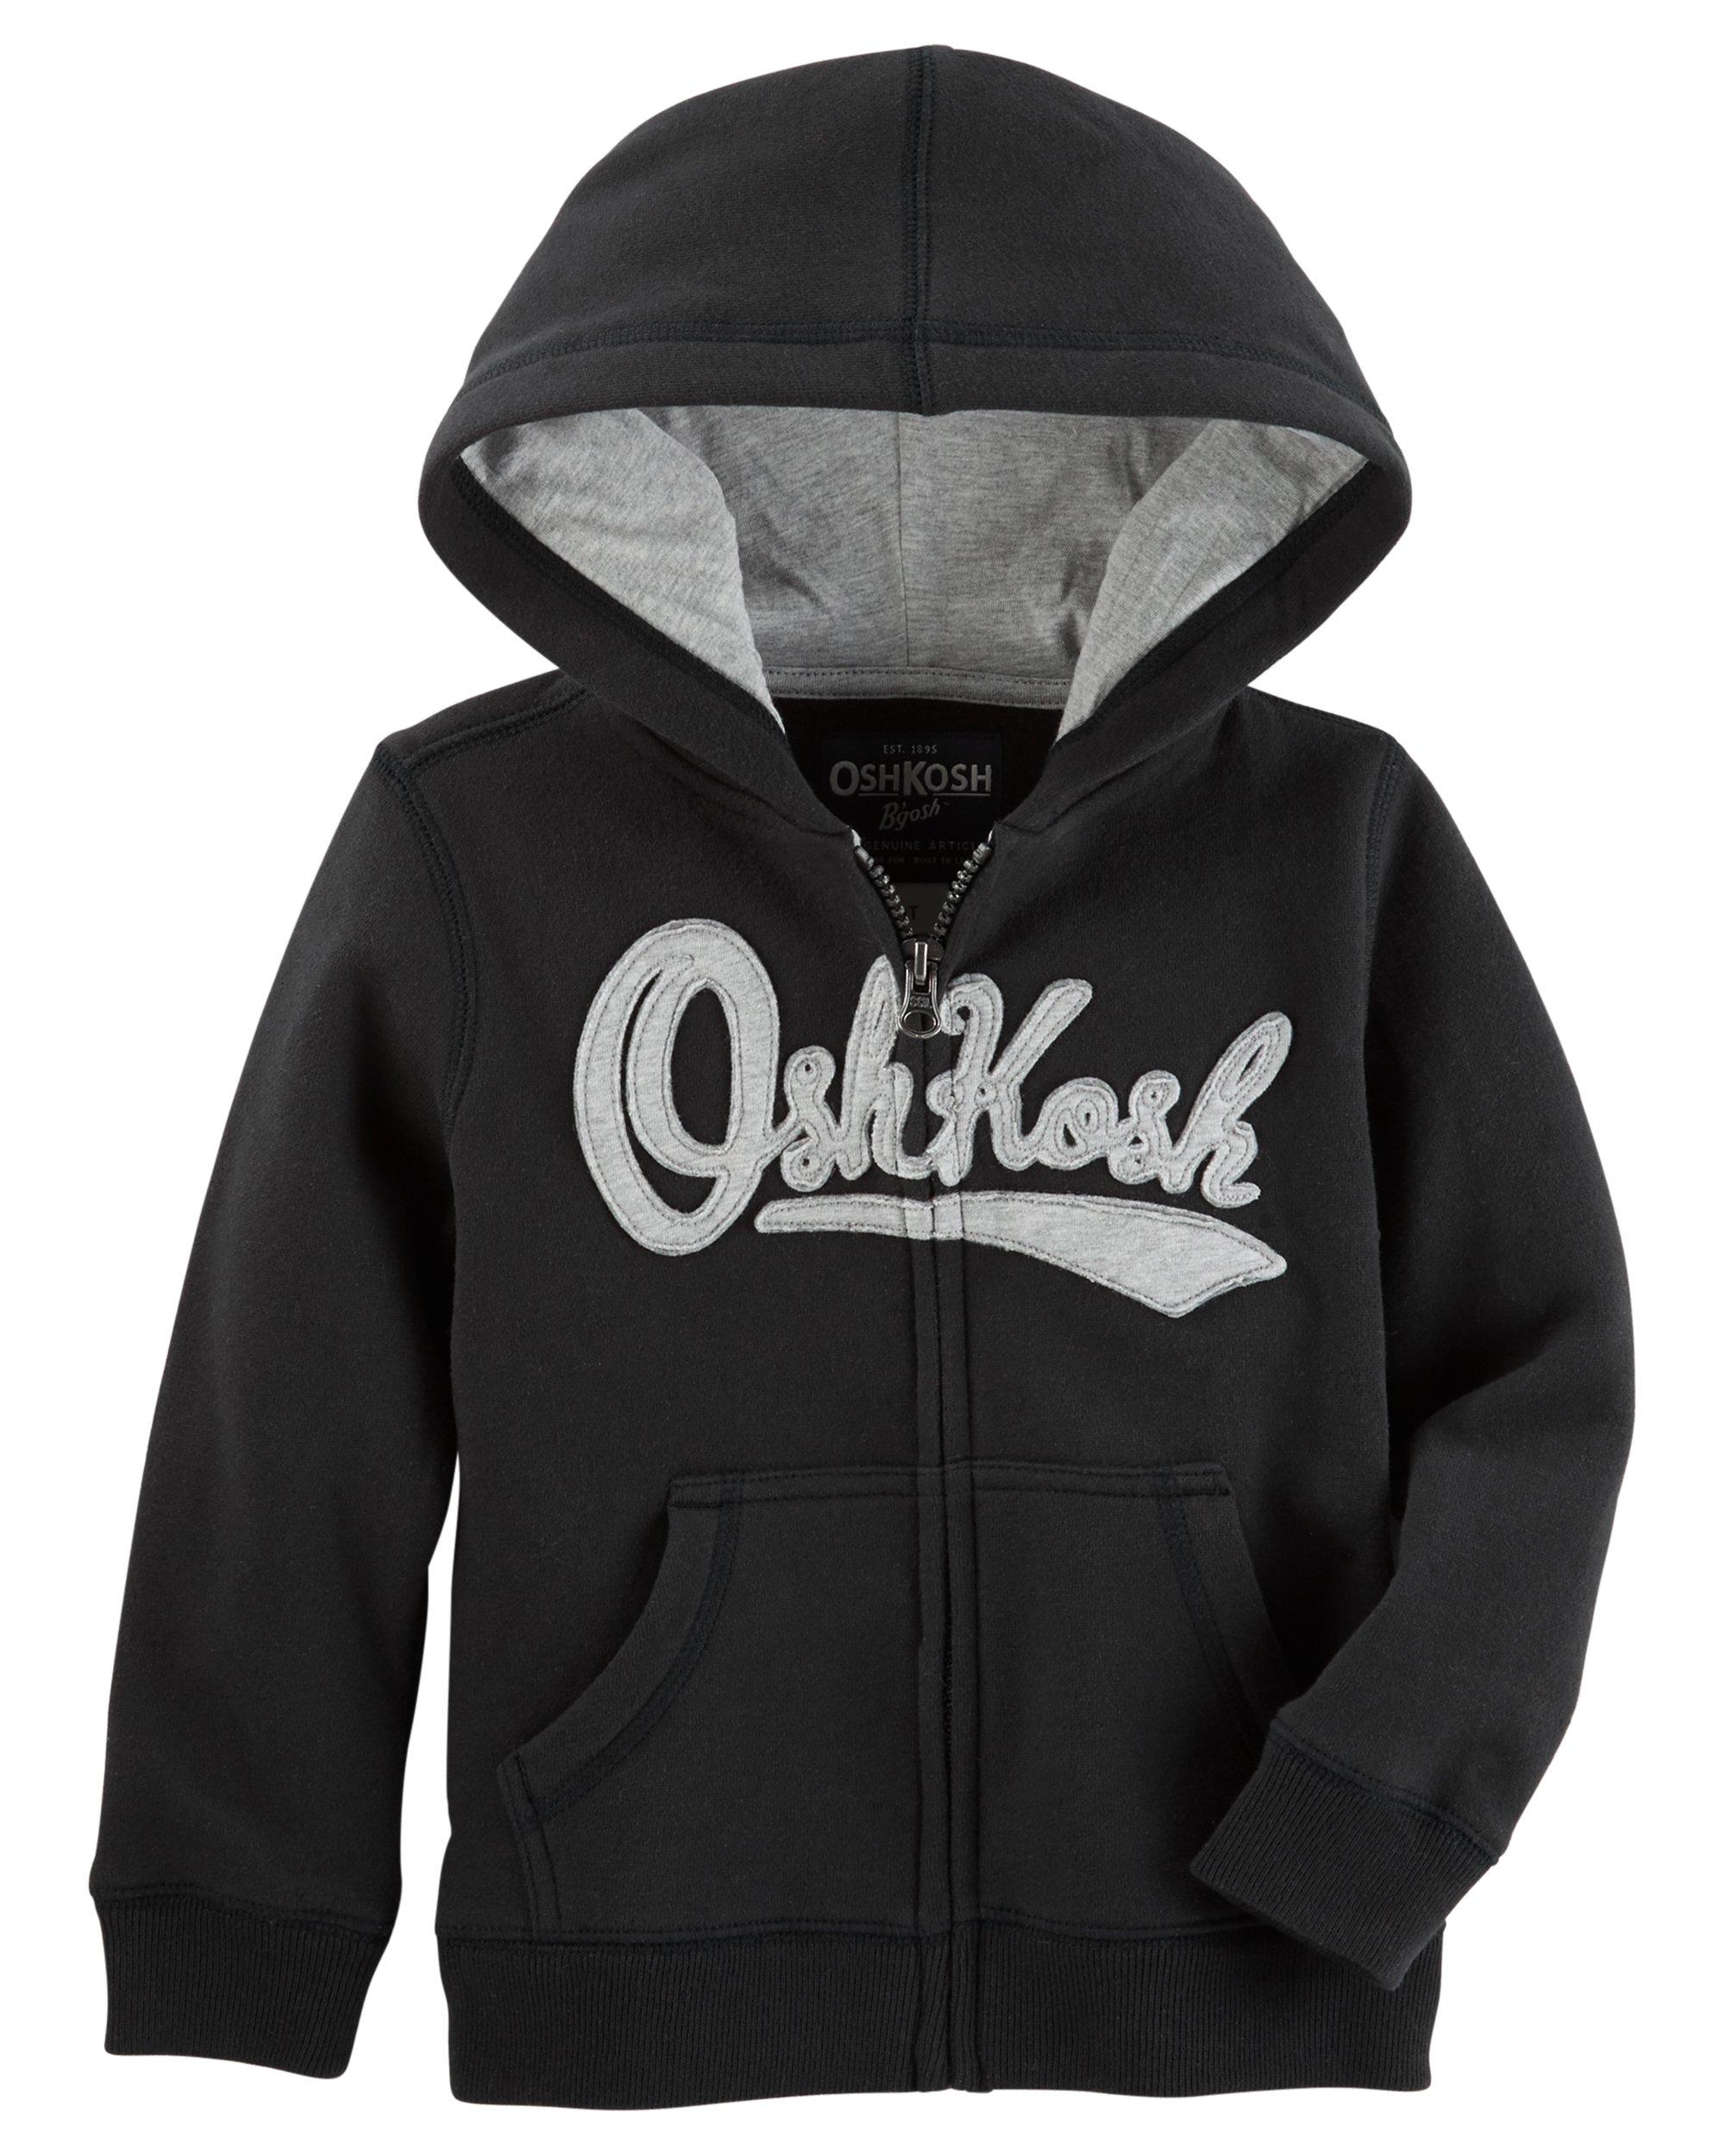 OshKosh B'Gosh Boys' Toddler Full Zip Logo Hoodie, Midnight Black, 3T